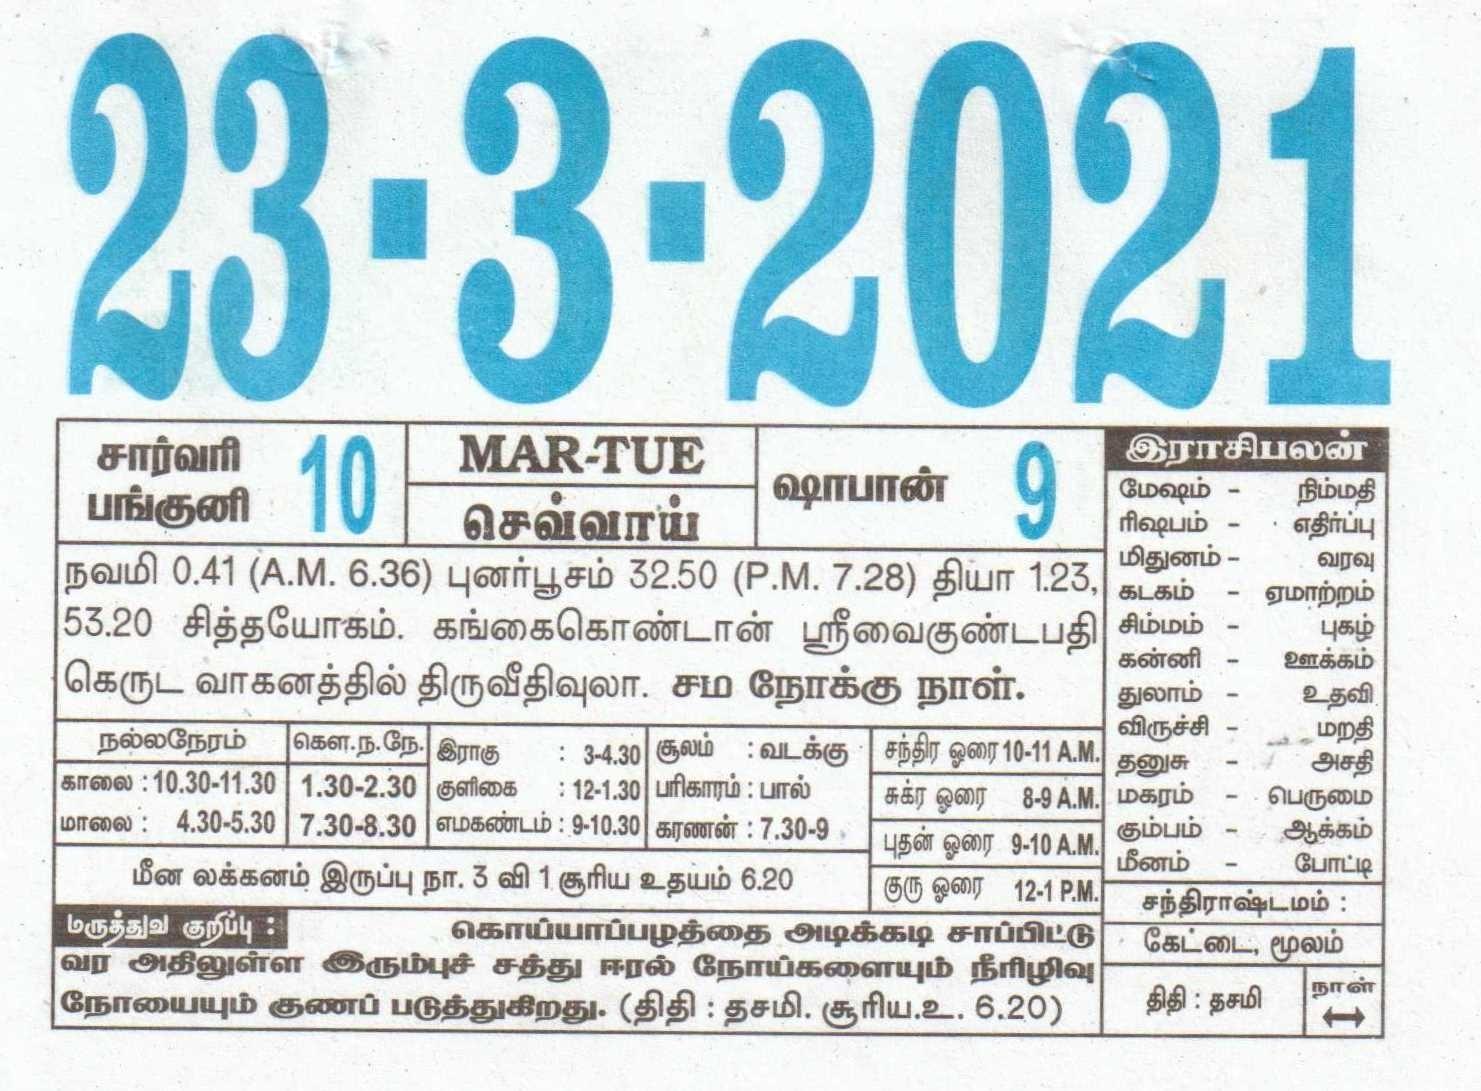 23-03-2021 Daily Calendar | Date 23 , January Daily Tear Off Calendar | Daily Panchangam Rasi Palan November 2021 Calendar Tamil